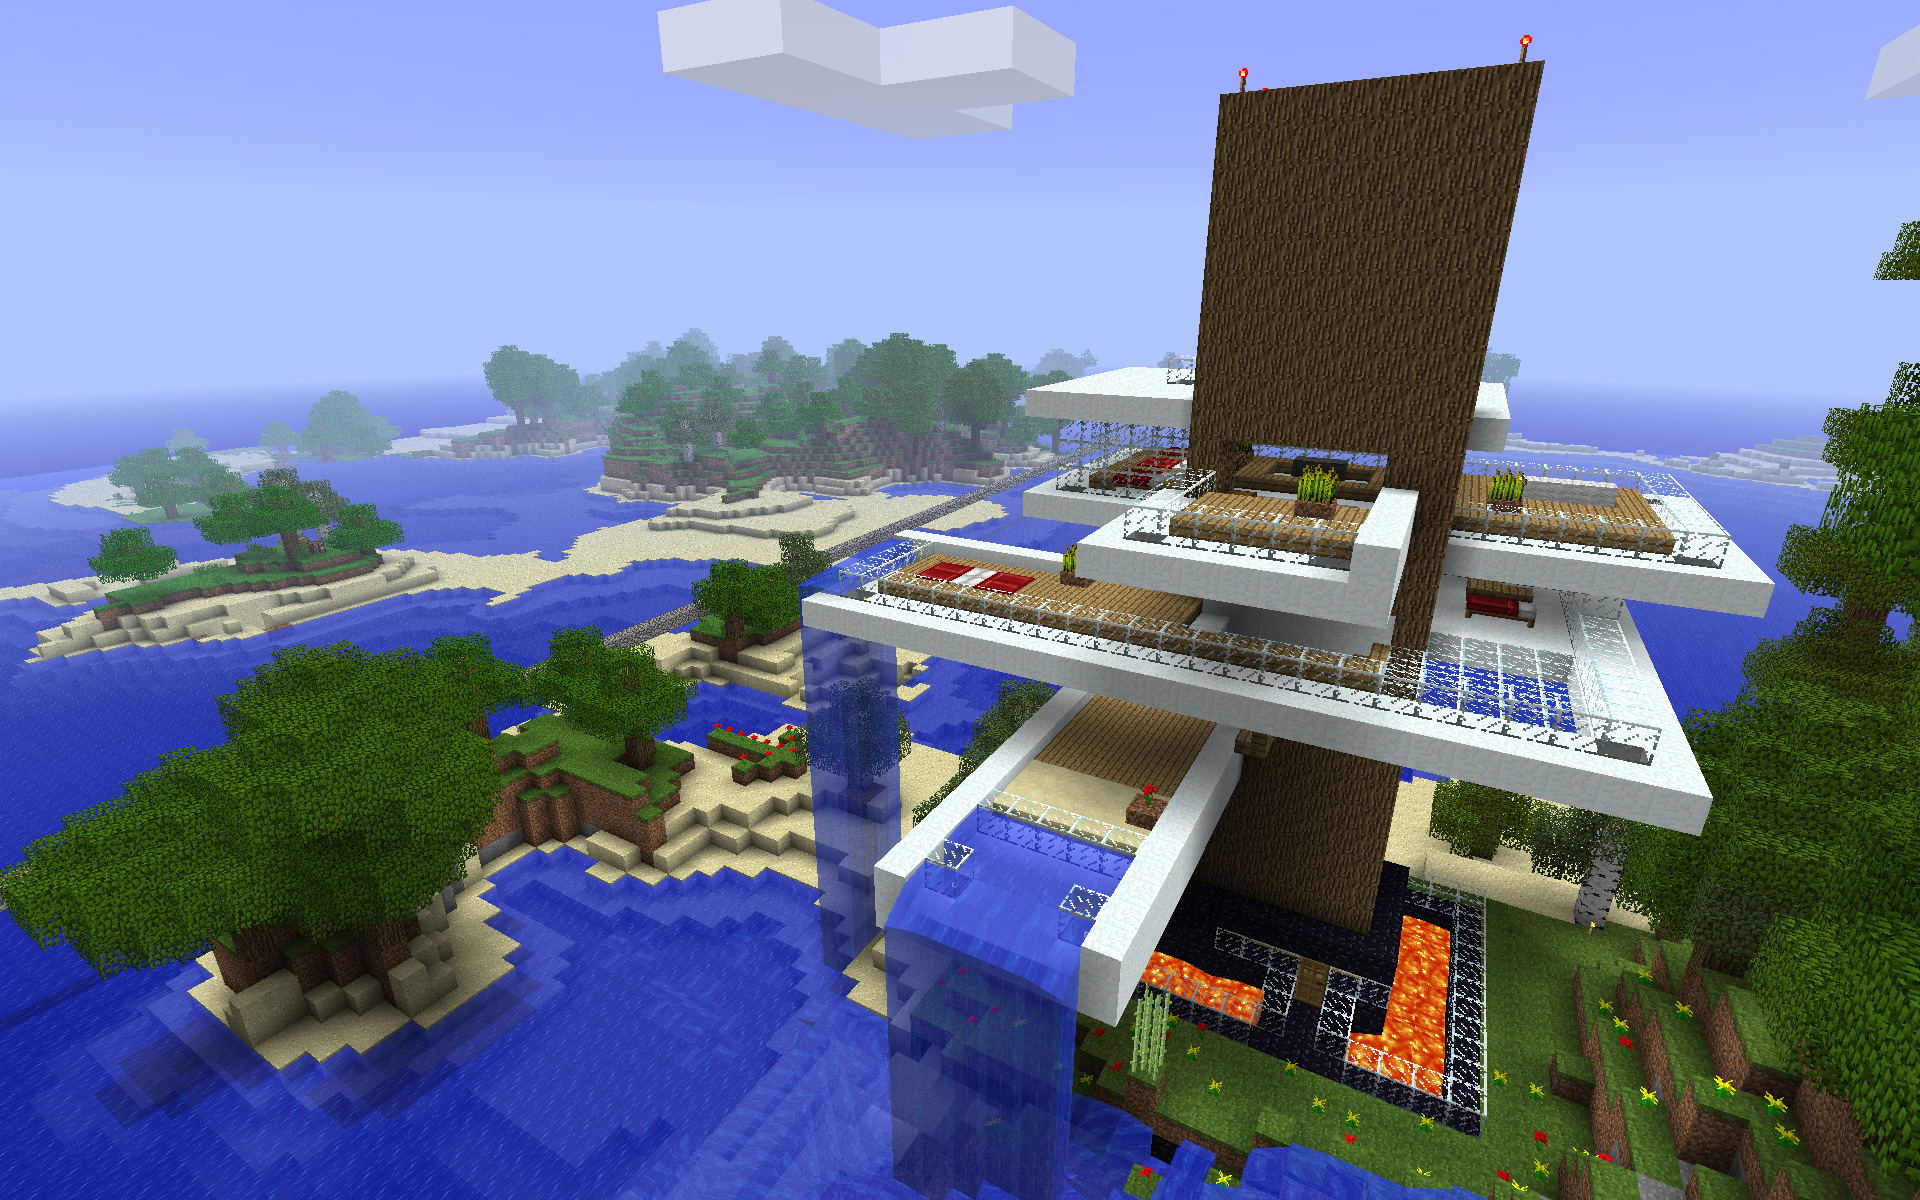 Fondos De Pantalla De Minecraft Wallpapers HD E Imgenes